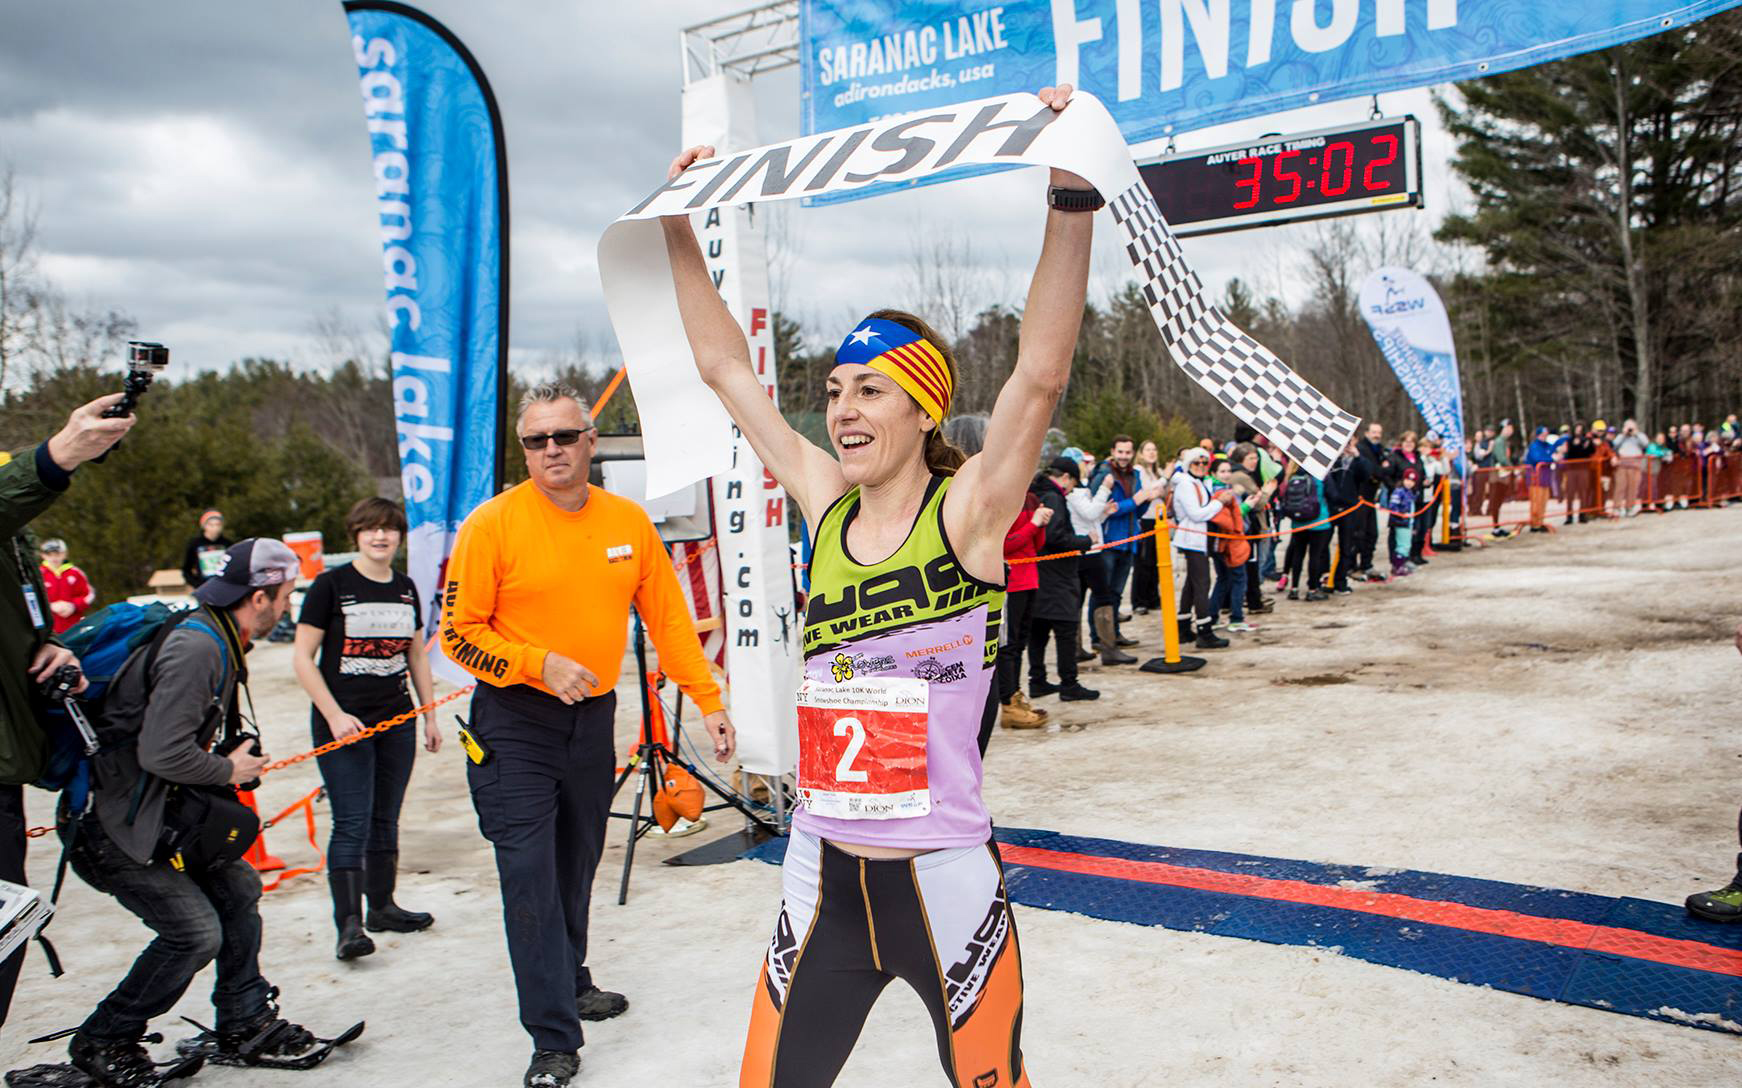 ■ Female champion, Ragna Debats of the Netherlands, crosses the line.  Photos Courtesy of Saranac Lake ADK